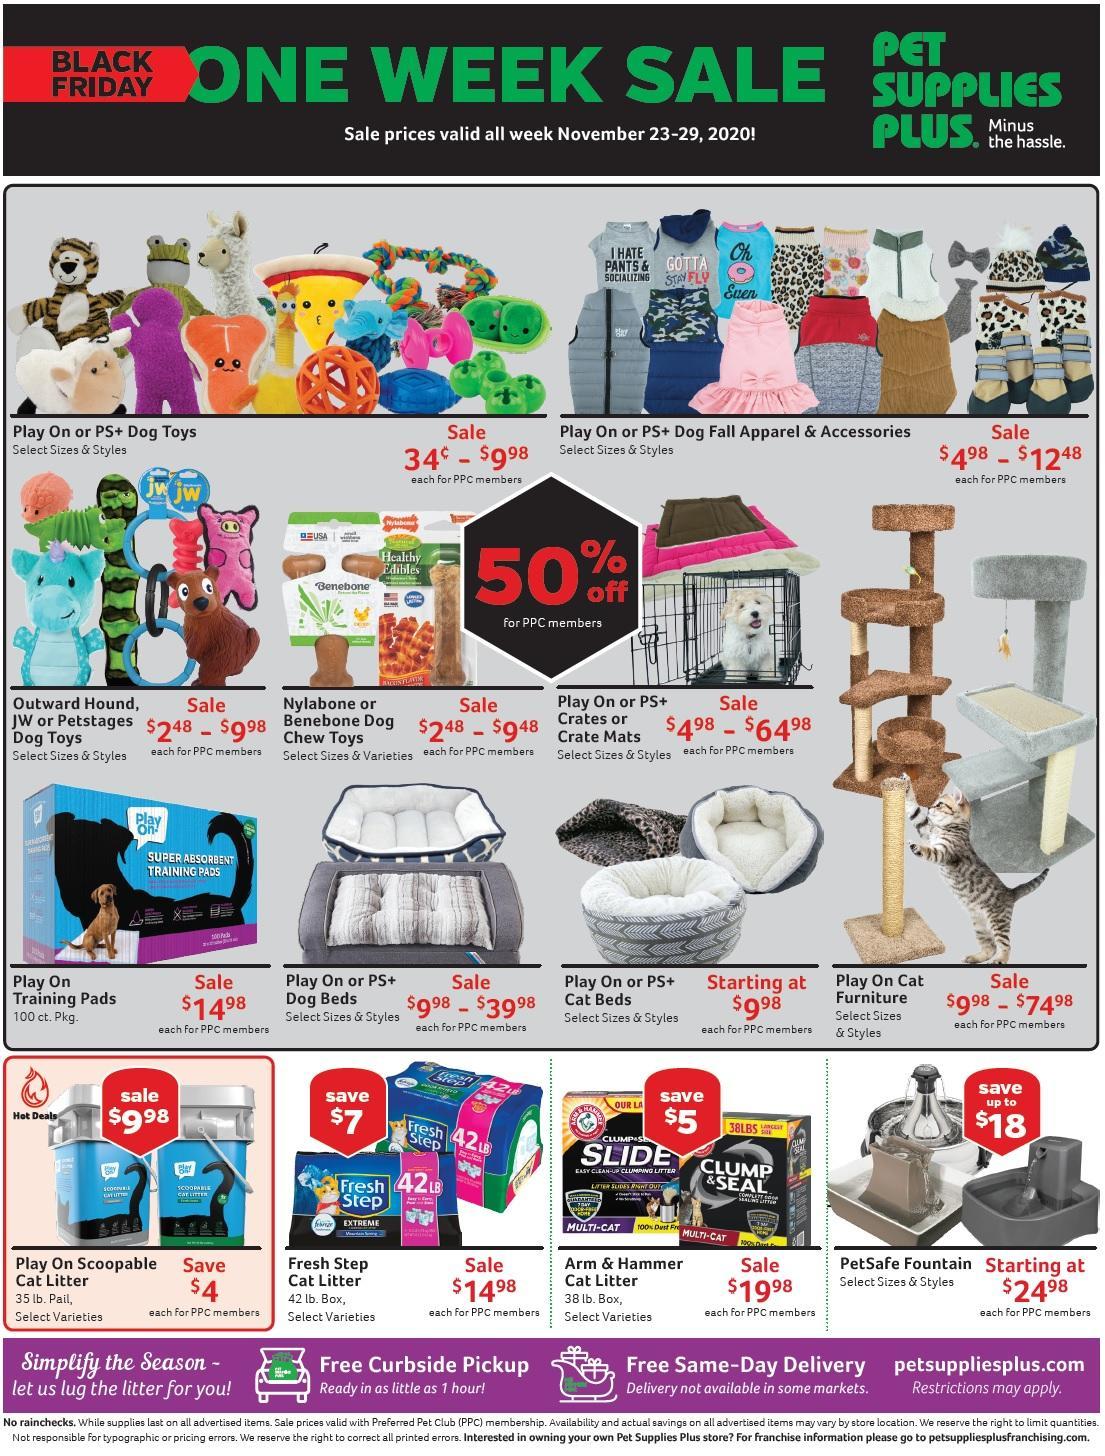 Pet Supplies Plus Black Friday 2020 Page 4